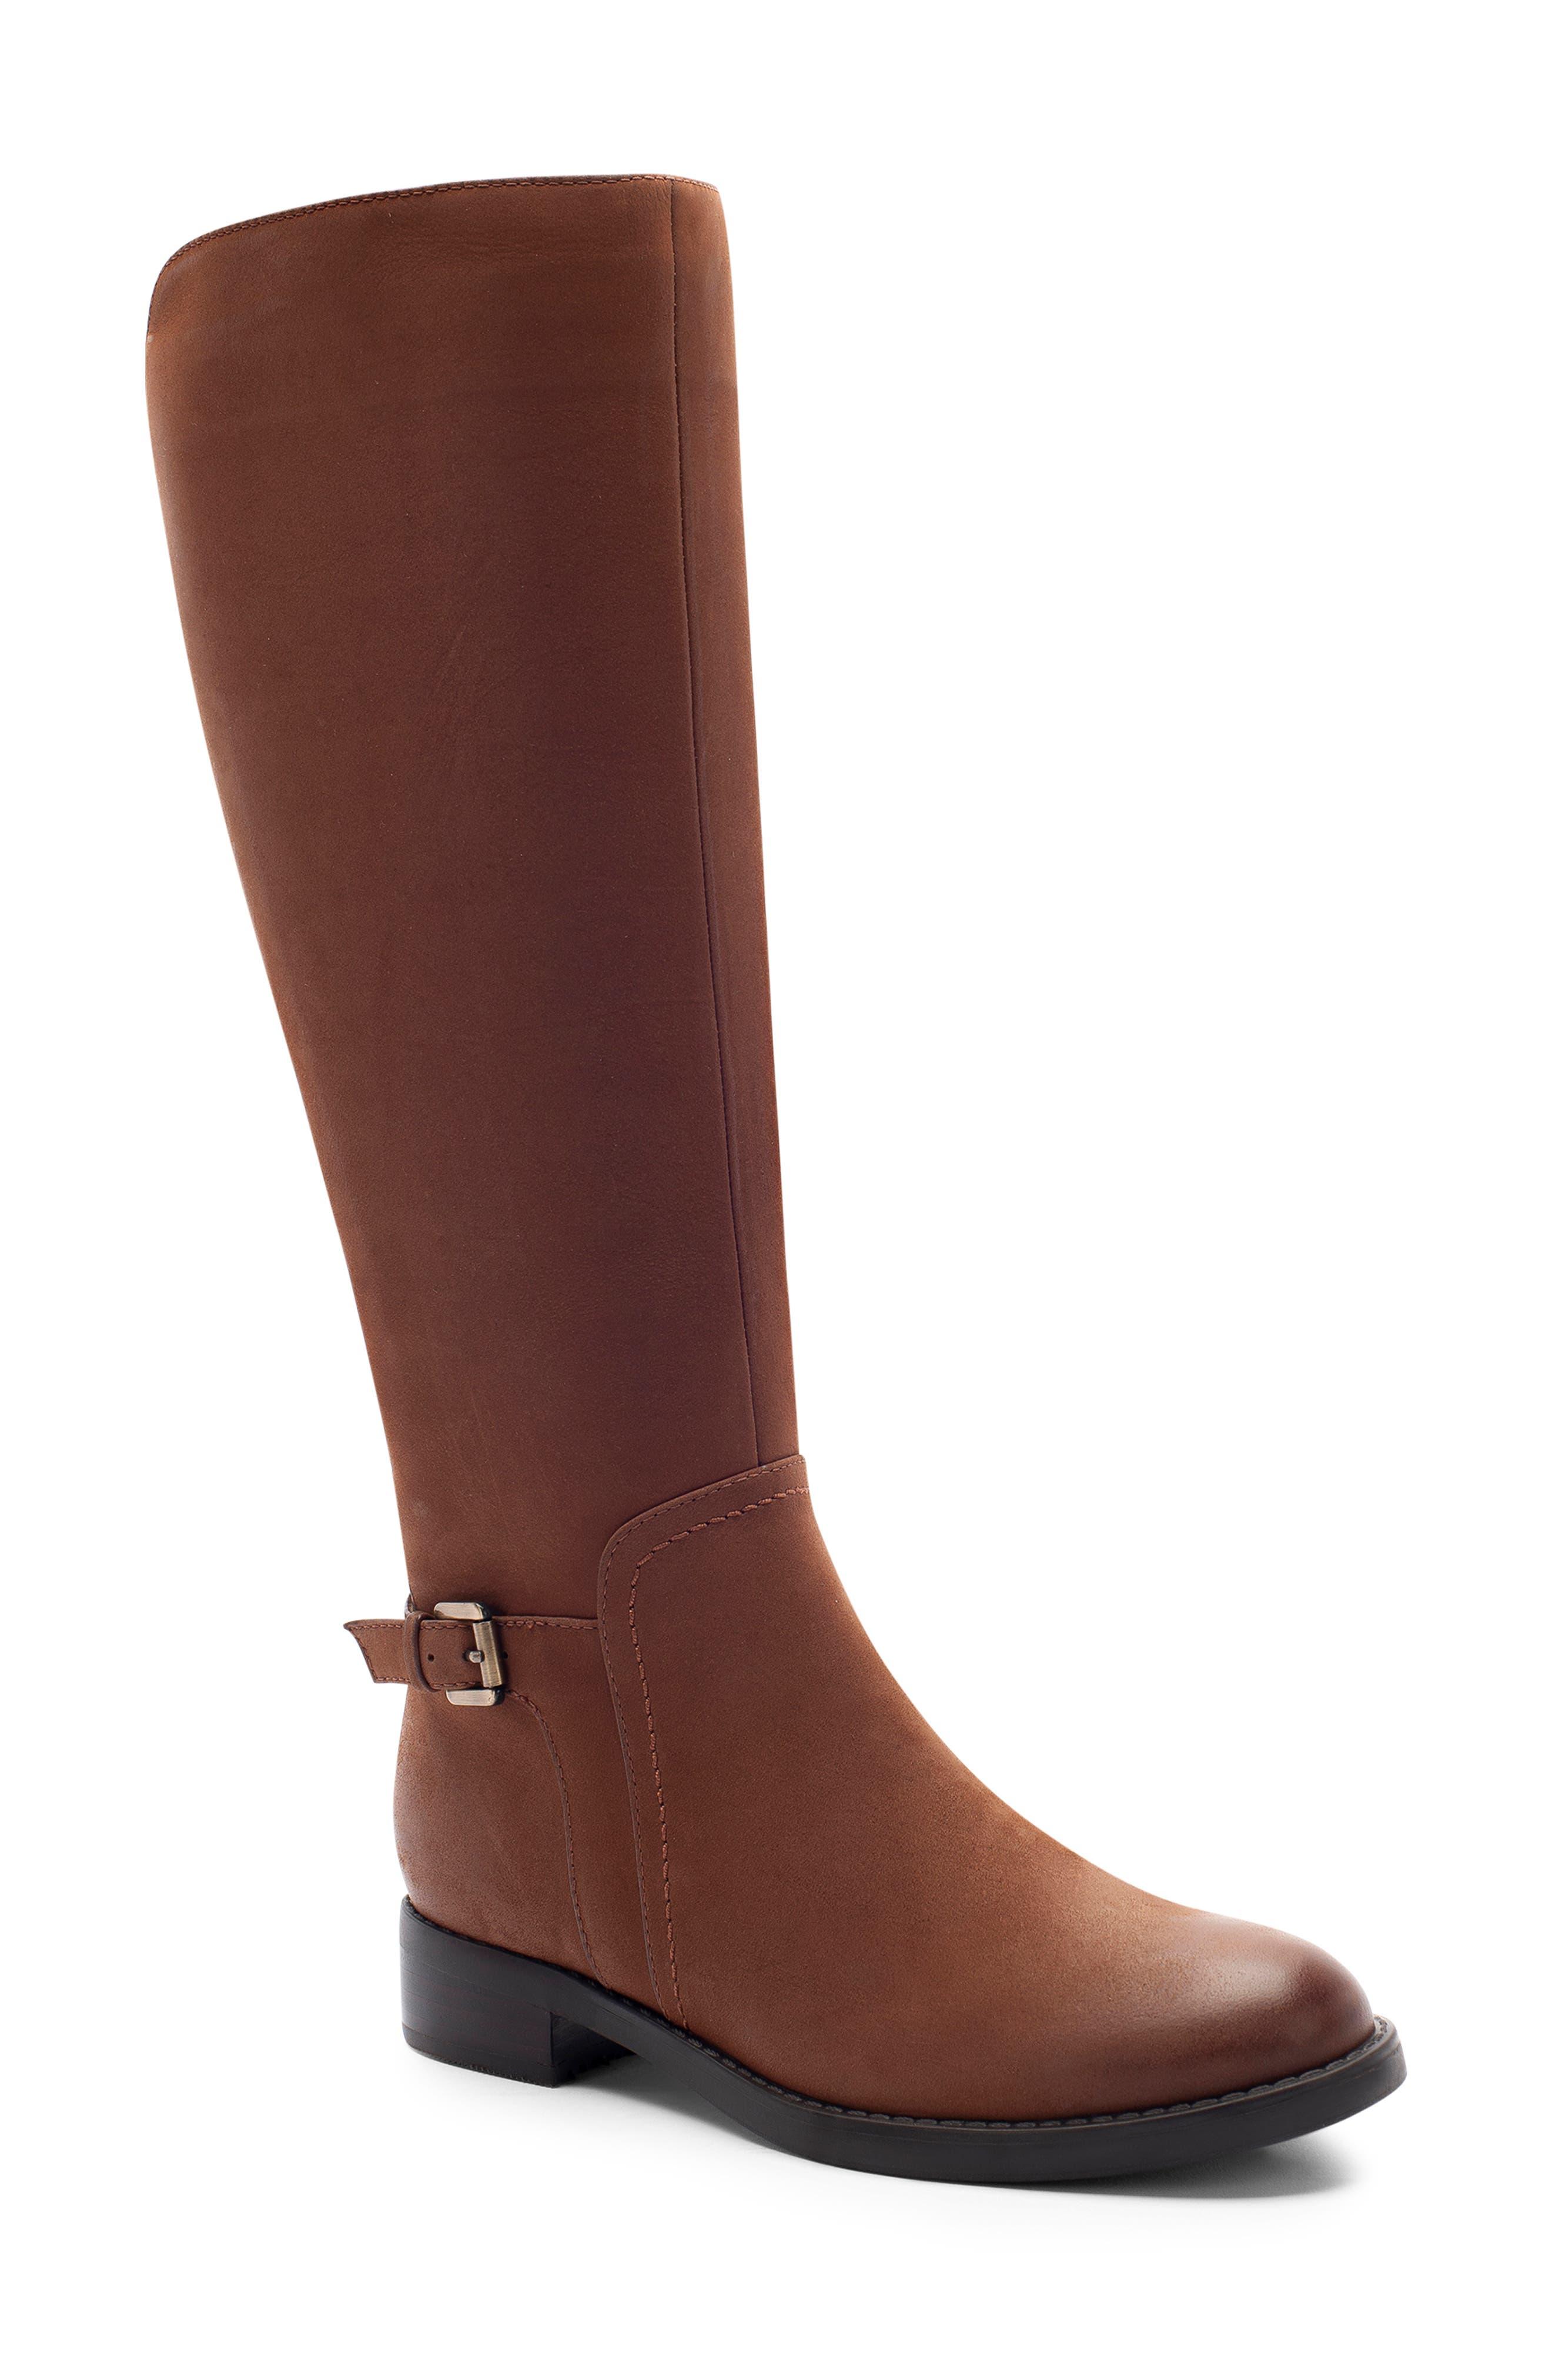 Blondo Evie Riding Waterproof Boot- Brown